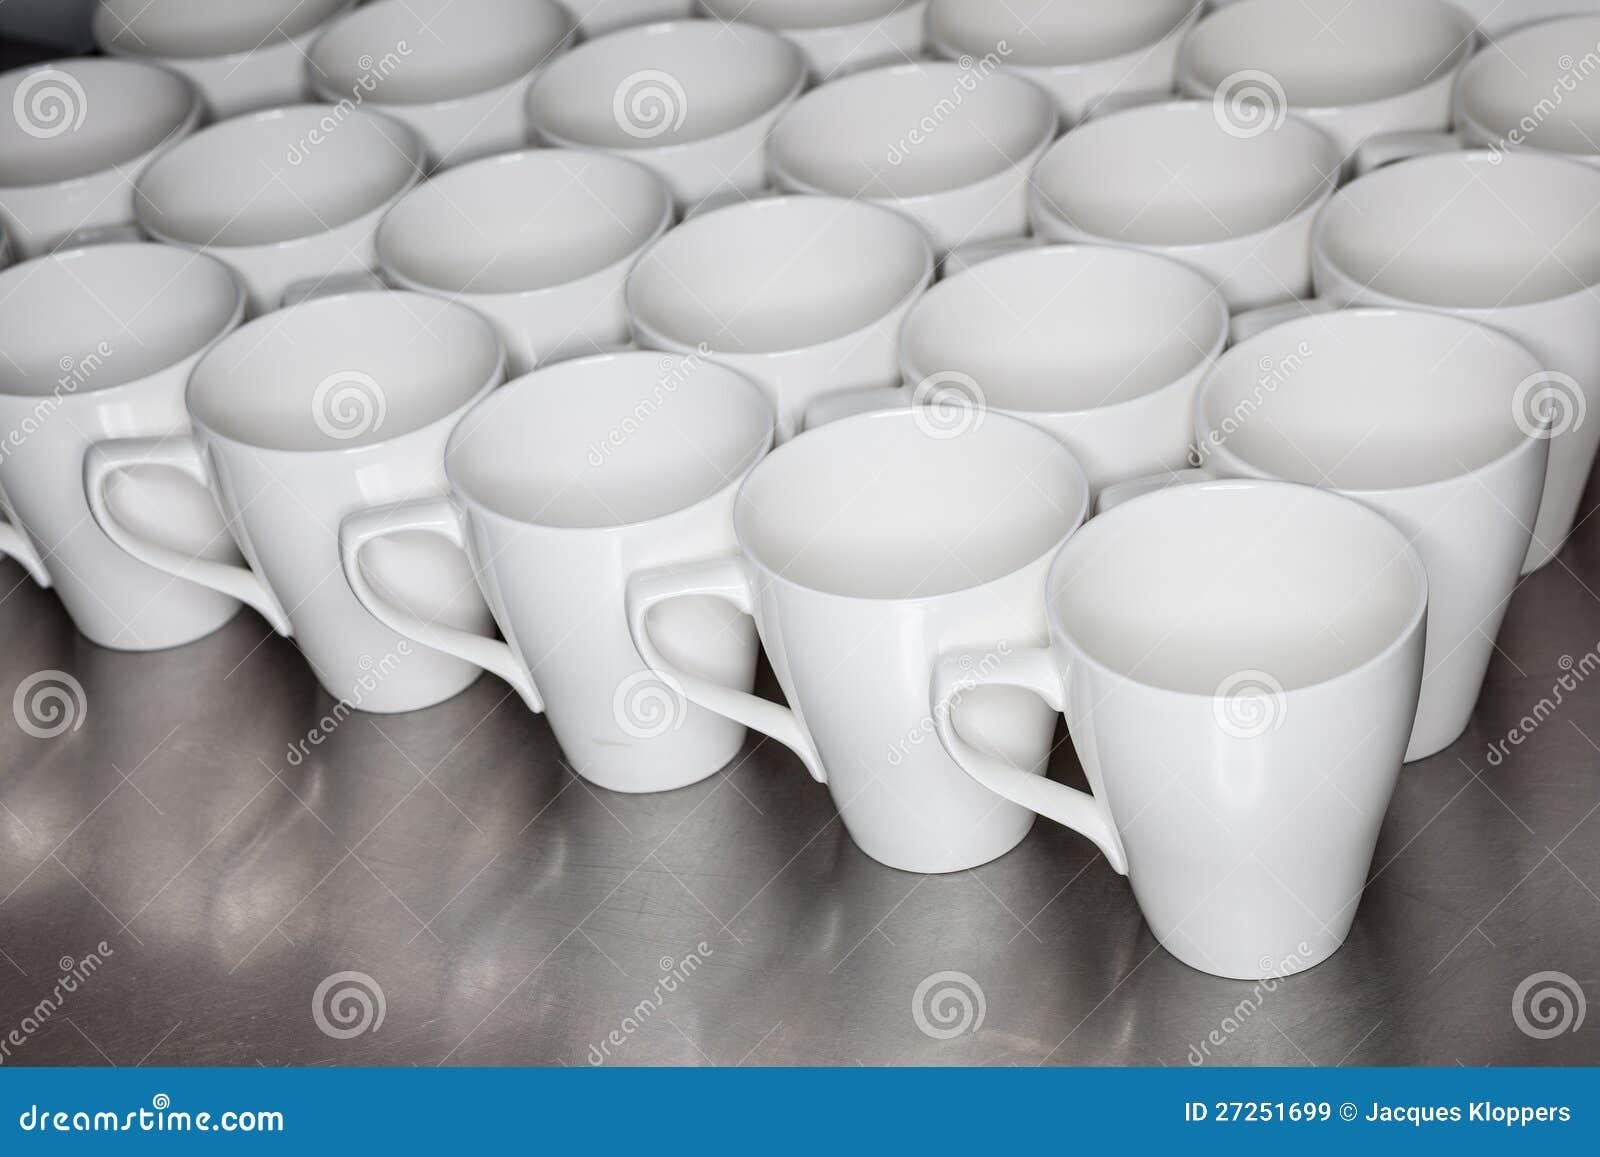 Ansammlung Kaffeetassen Im Büro Stockbild Bild Von Kaffee